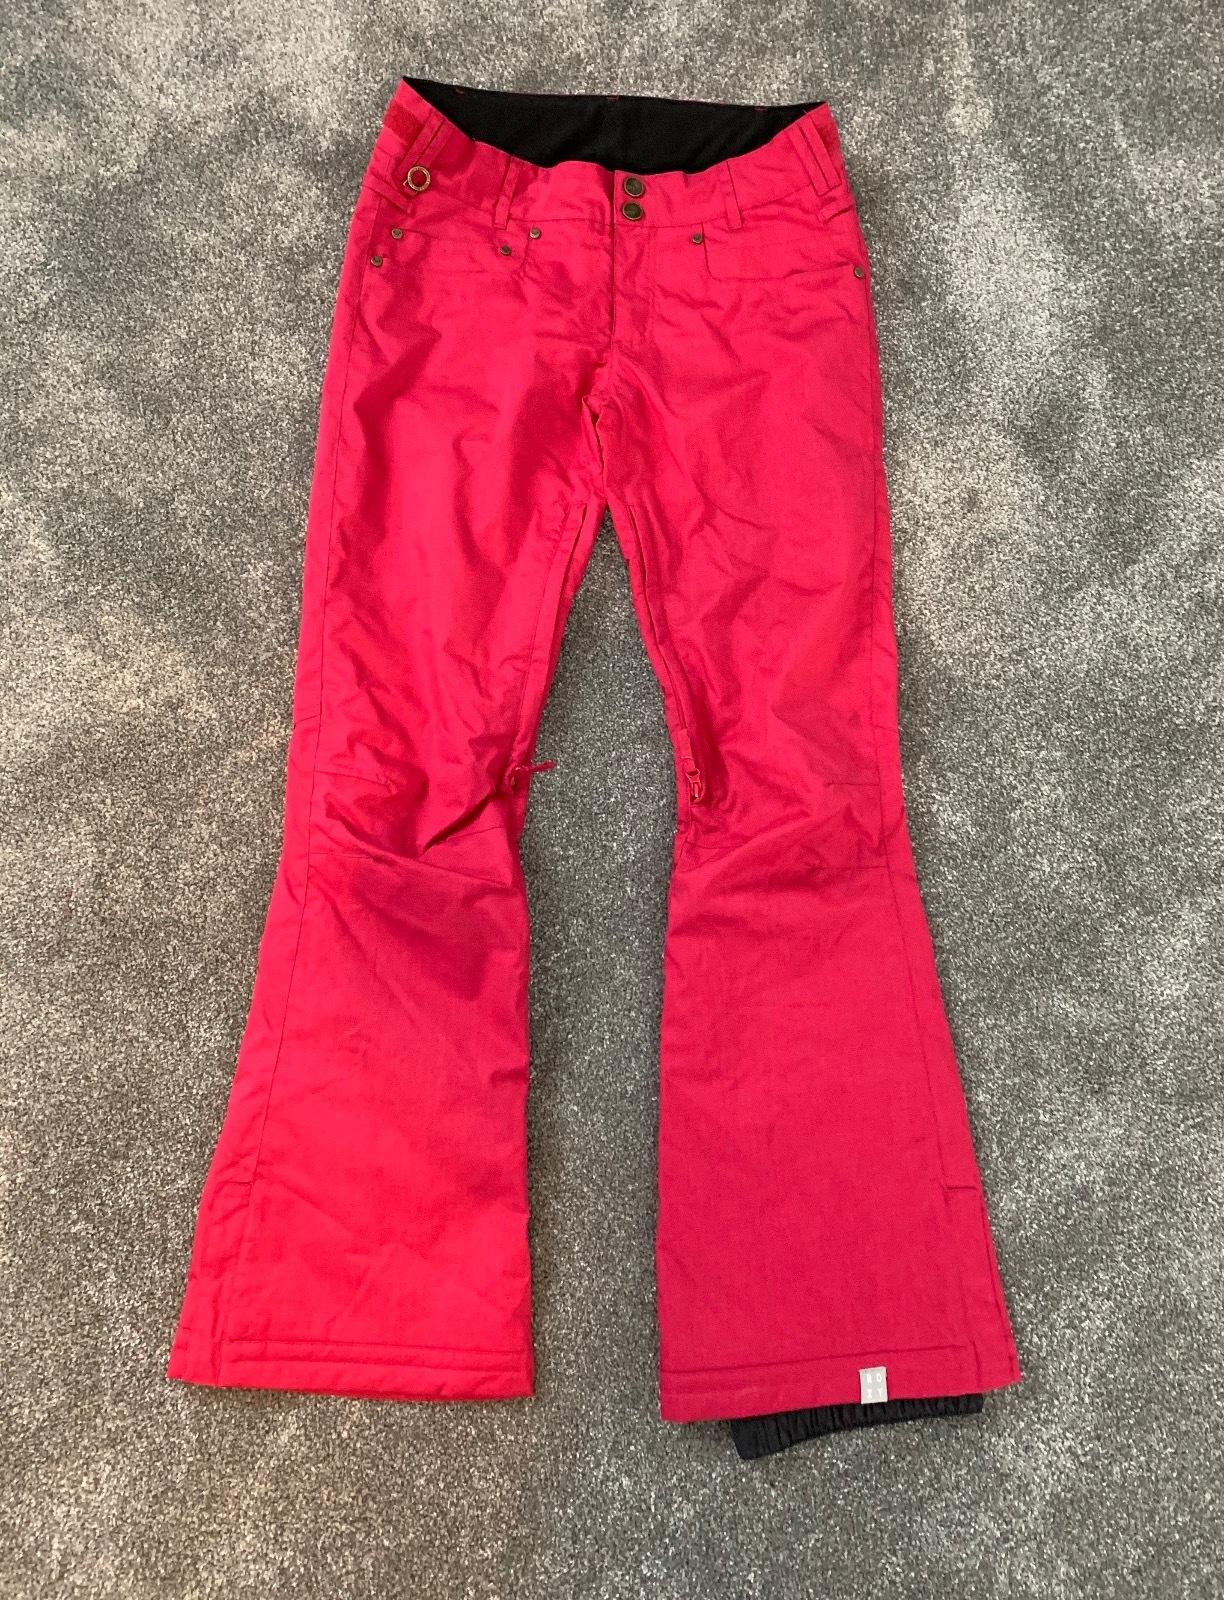 Women's Small Roxy Ski Trousers